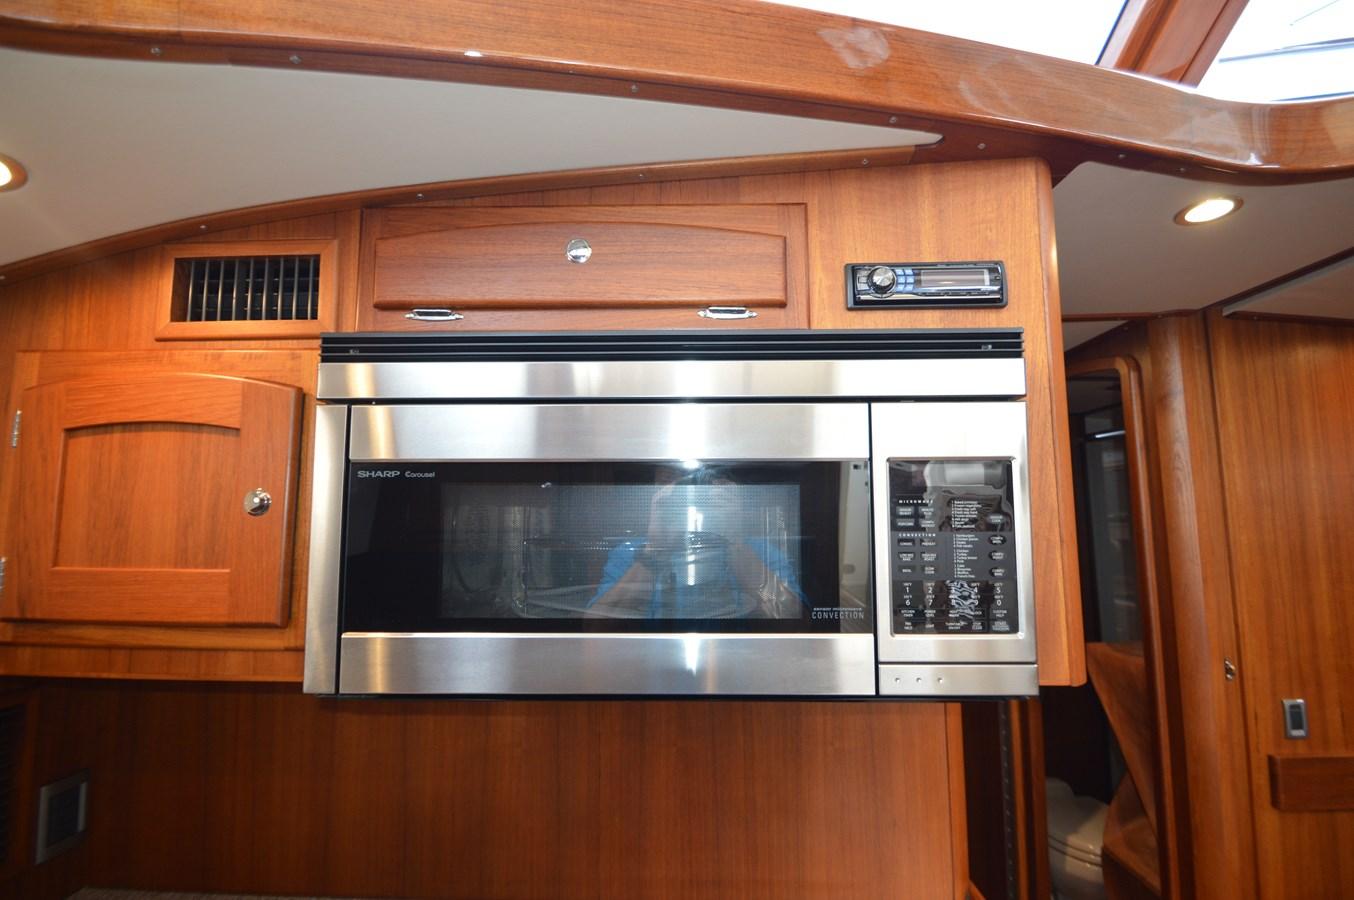 Microwave - 48 SAN JUAN For Sale